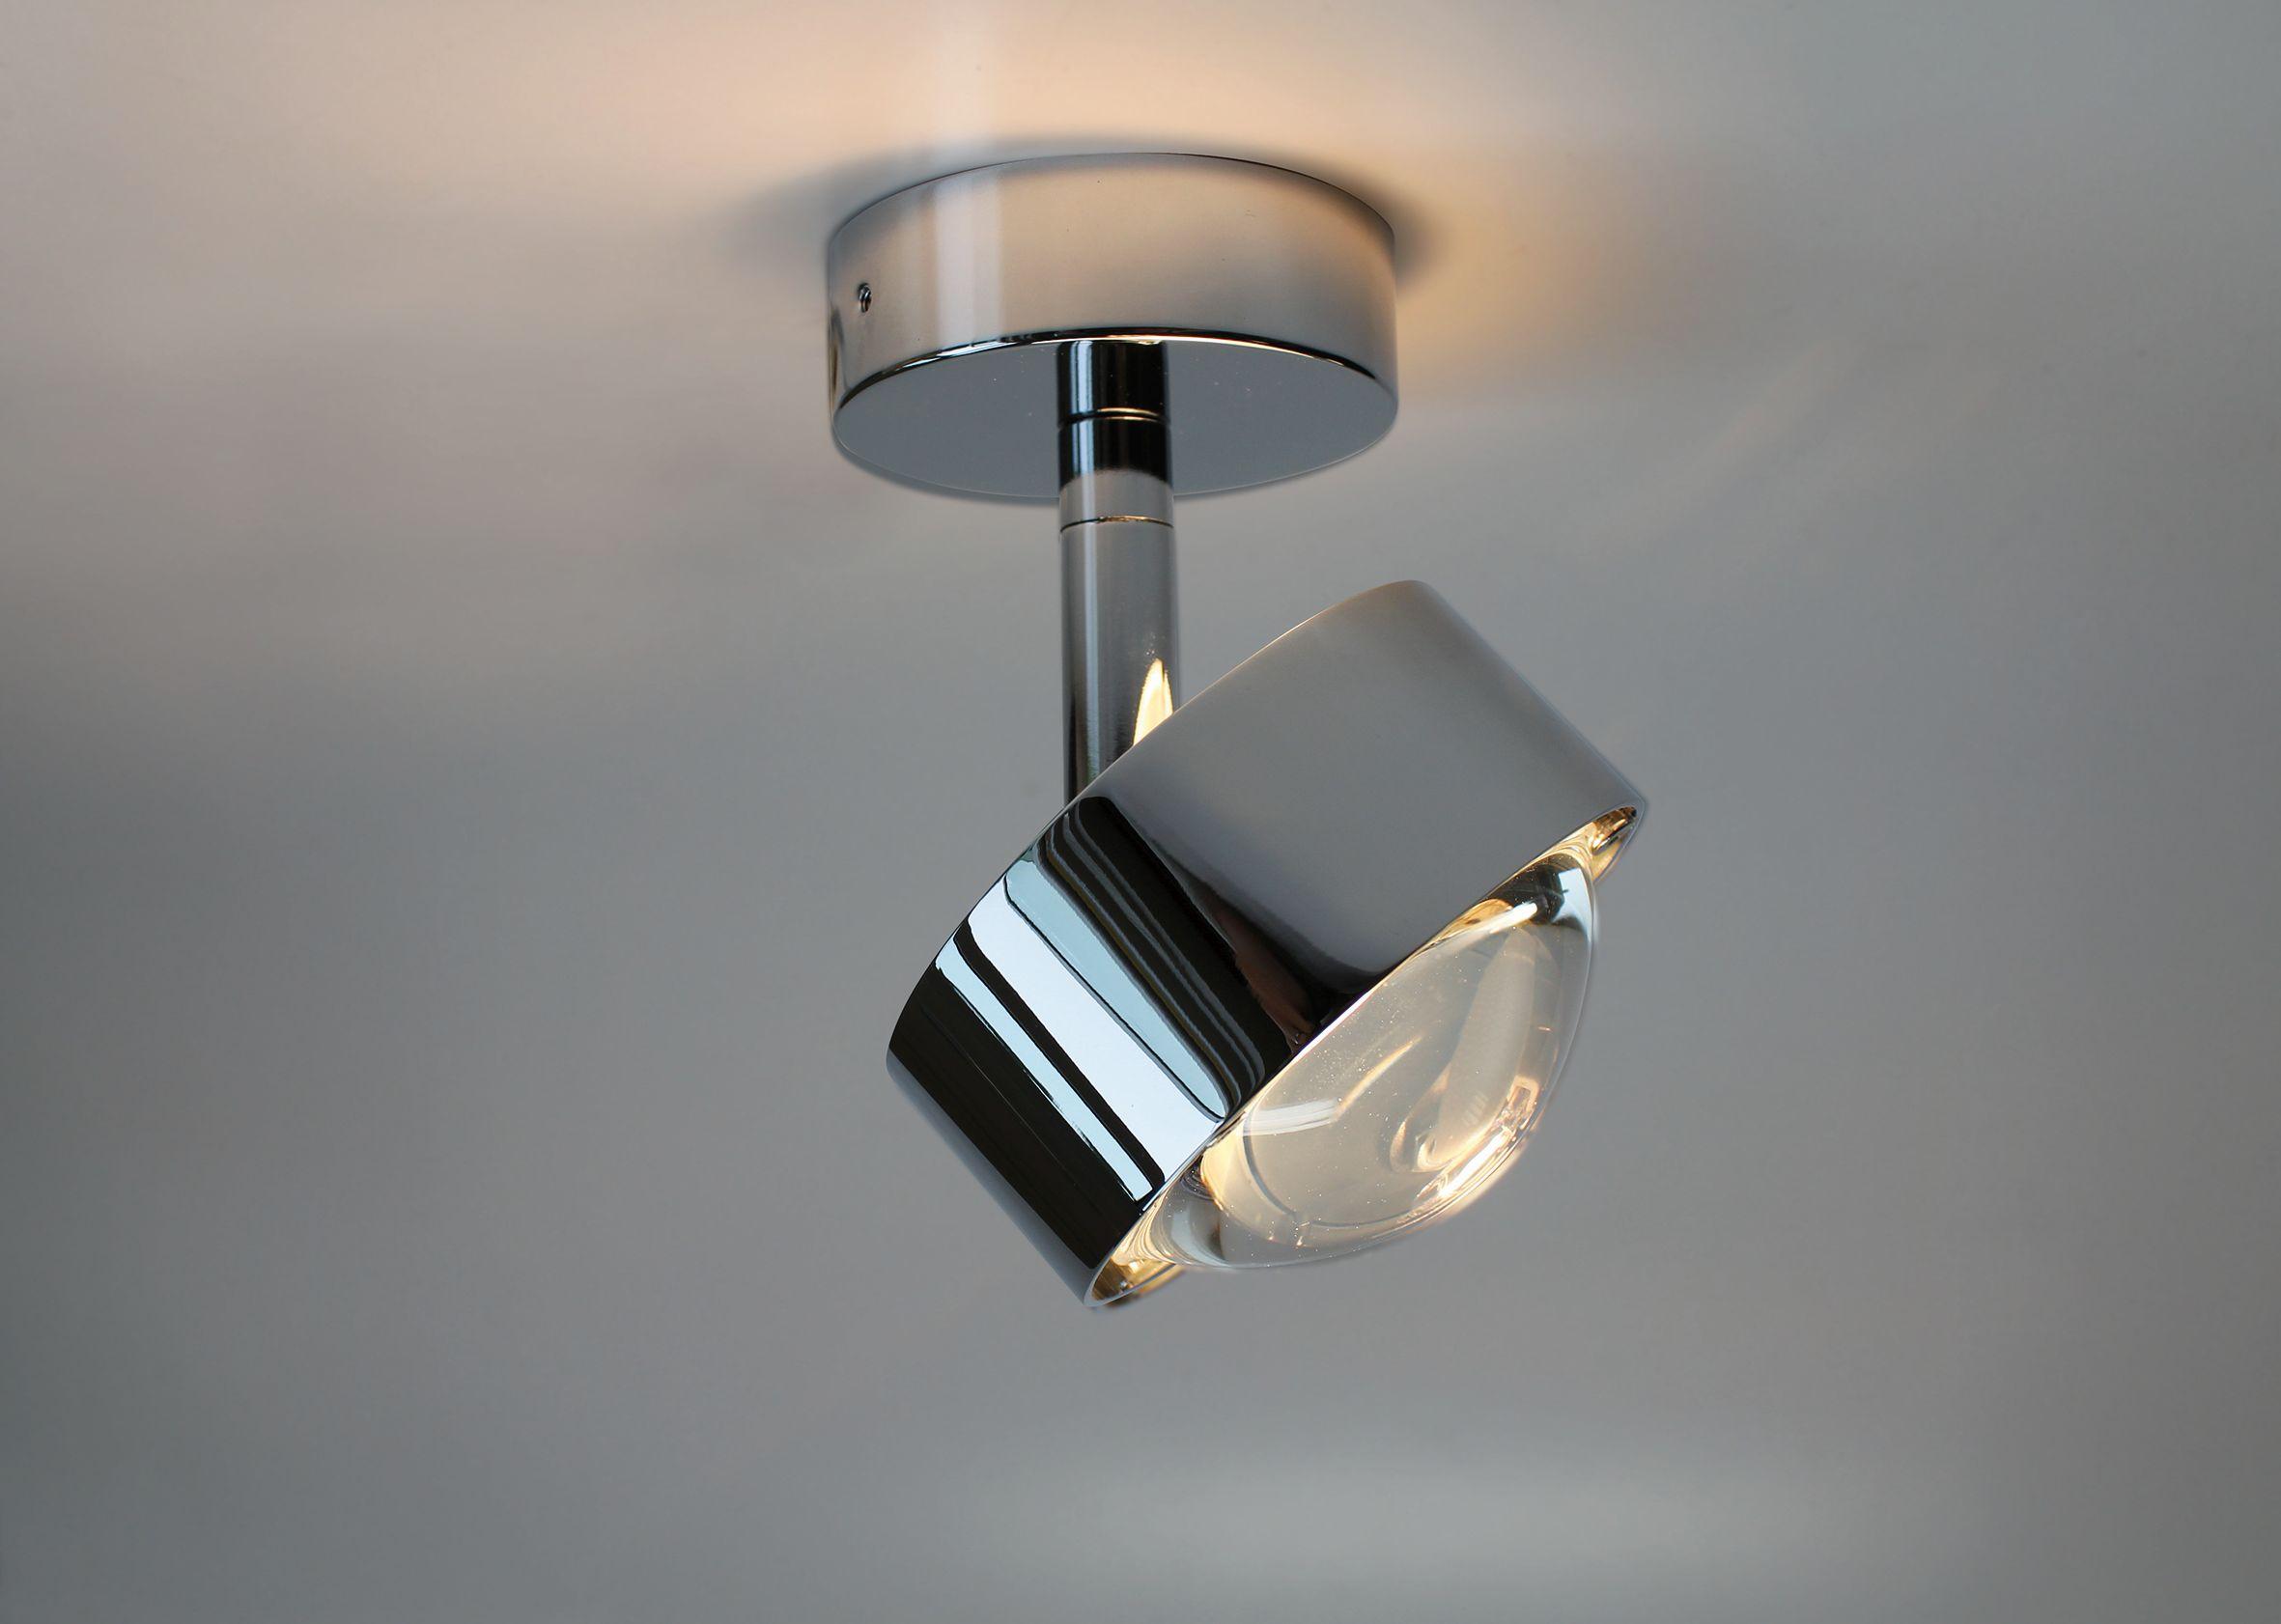 Top Light Leuchten Artikel von Top Light Leuchten Puk Turn + LED / up- & downlight 2-28001-LED